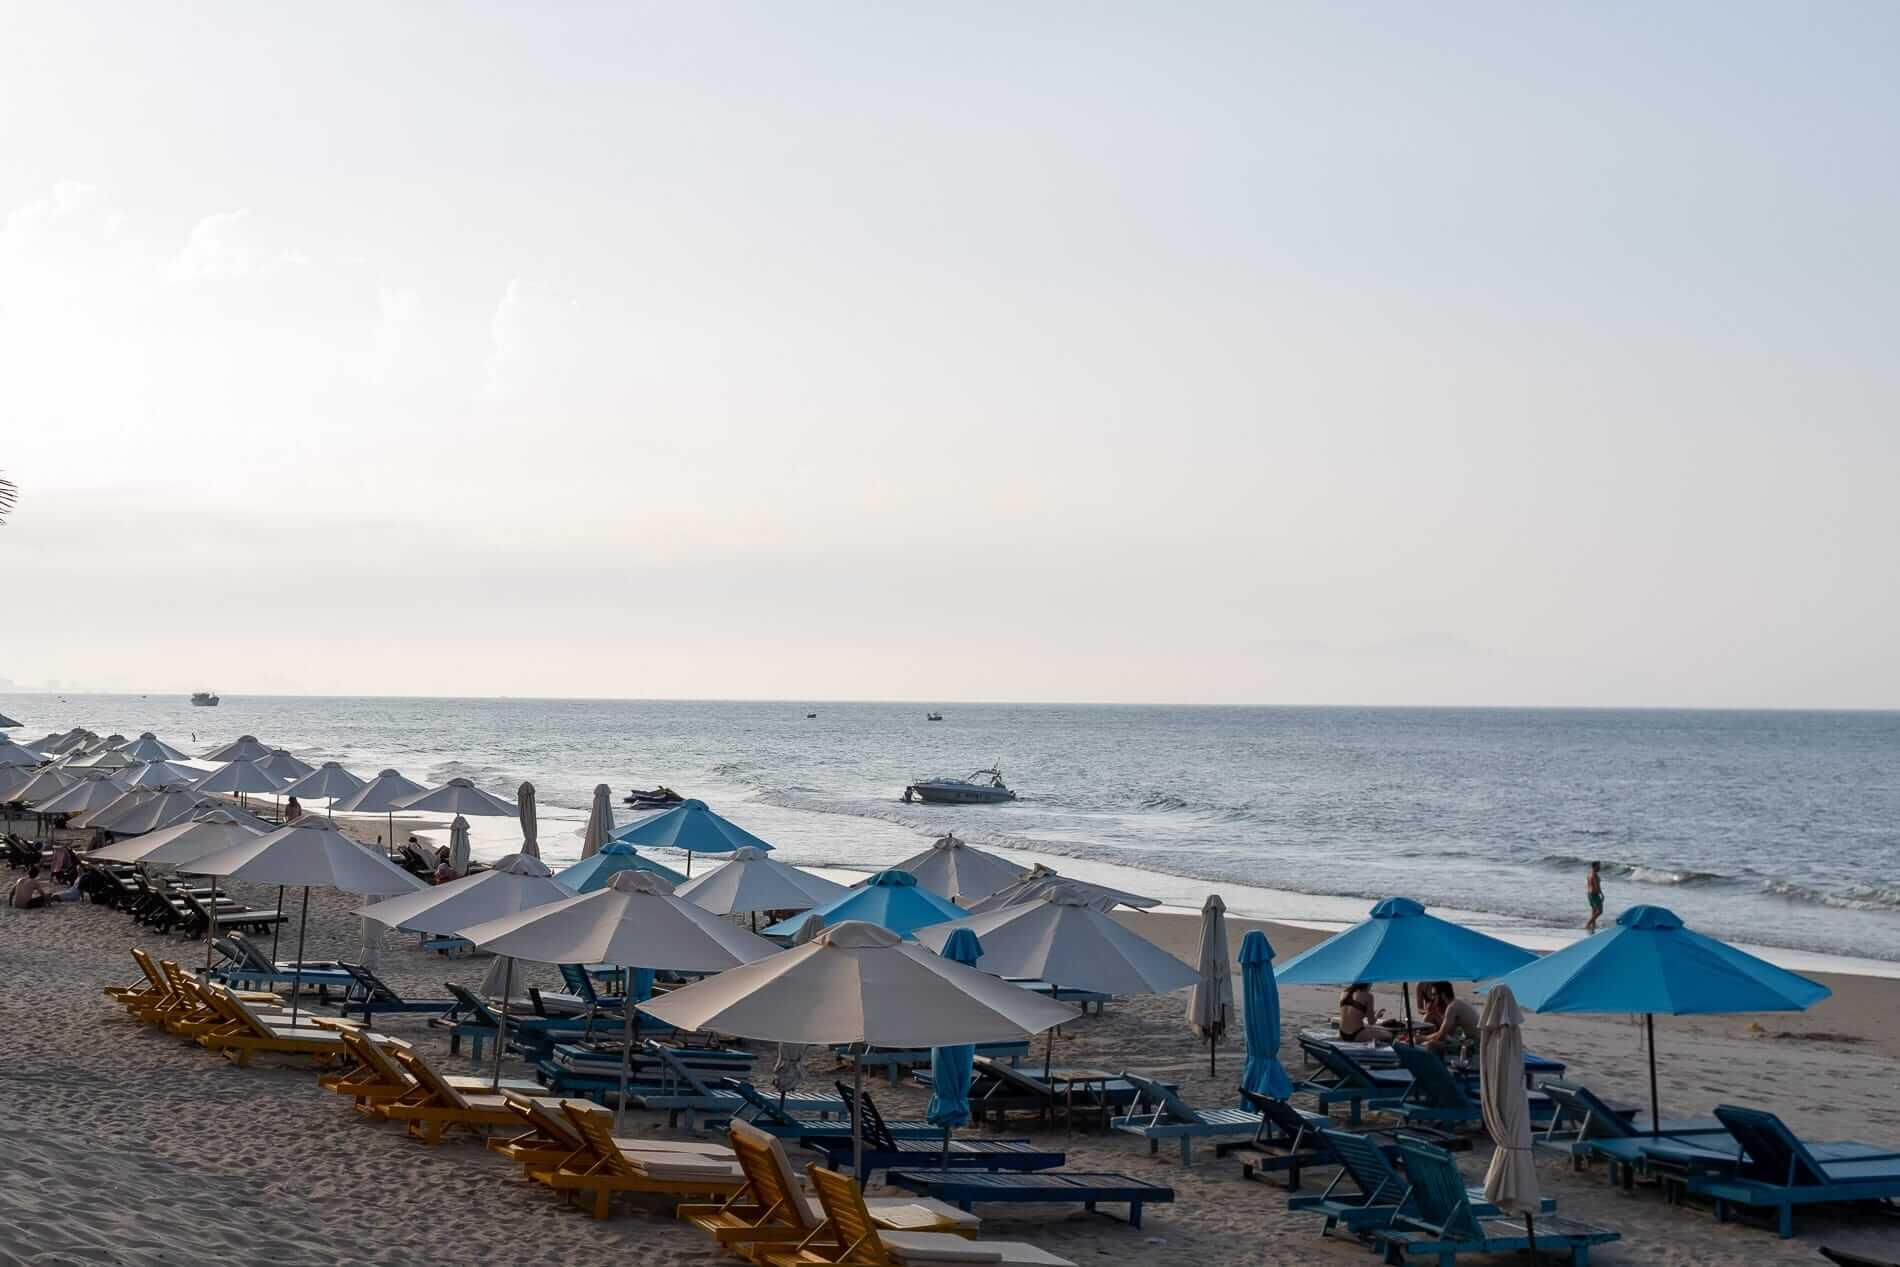 Sunloungers line the beach in Hoi An